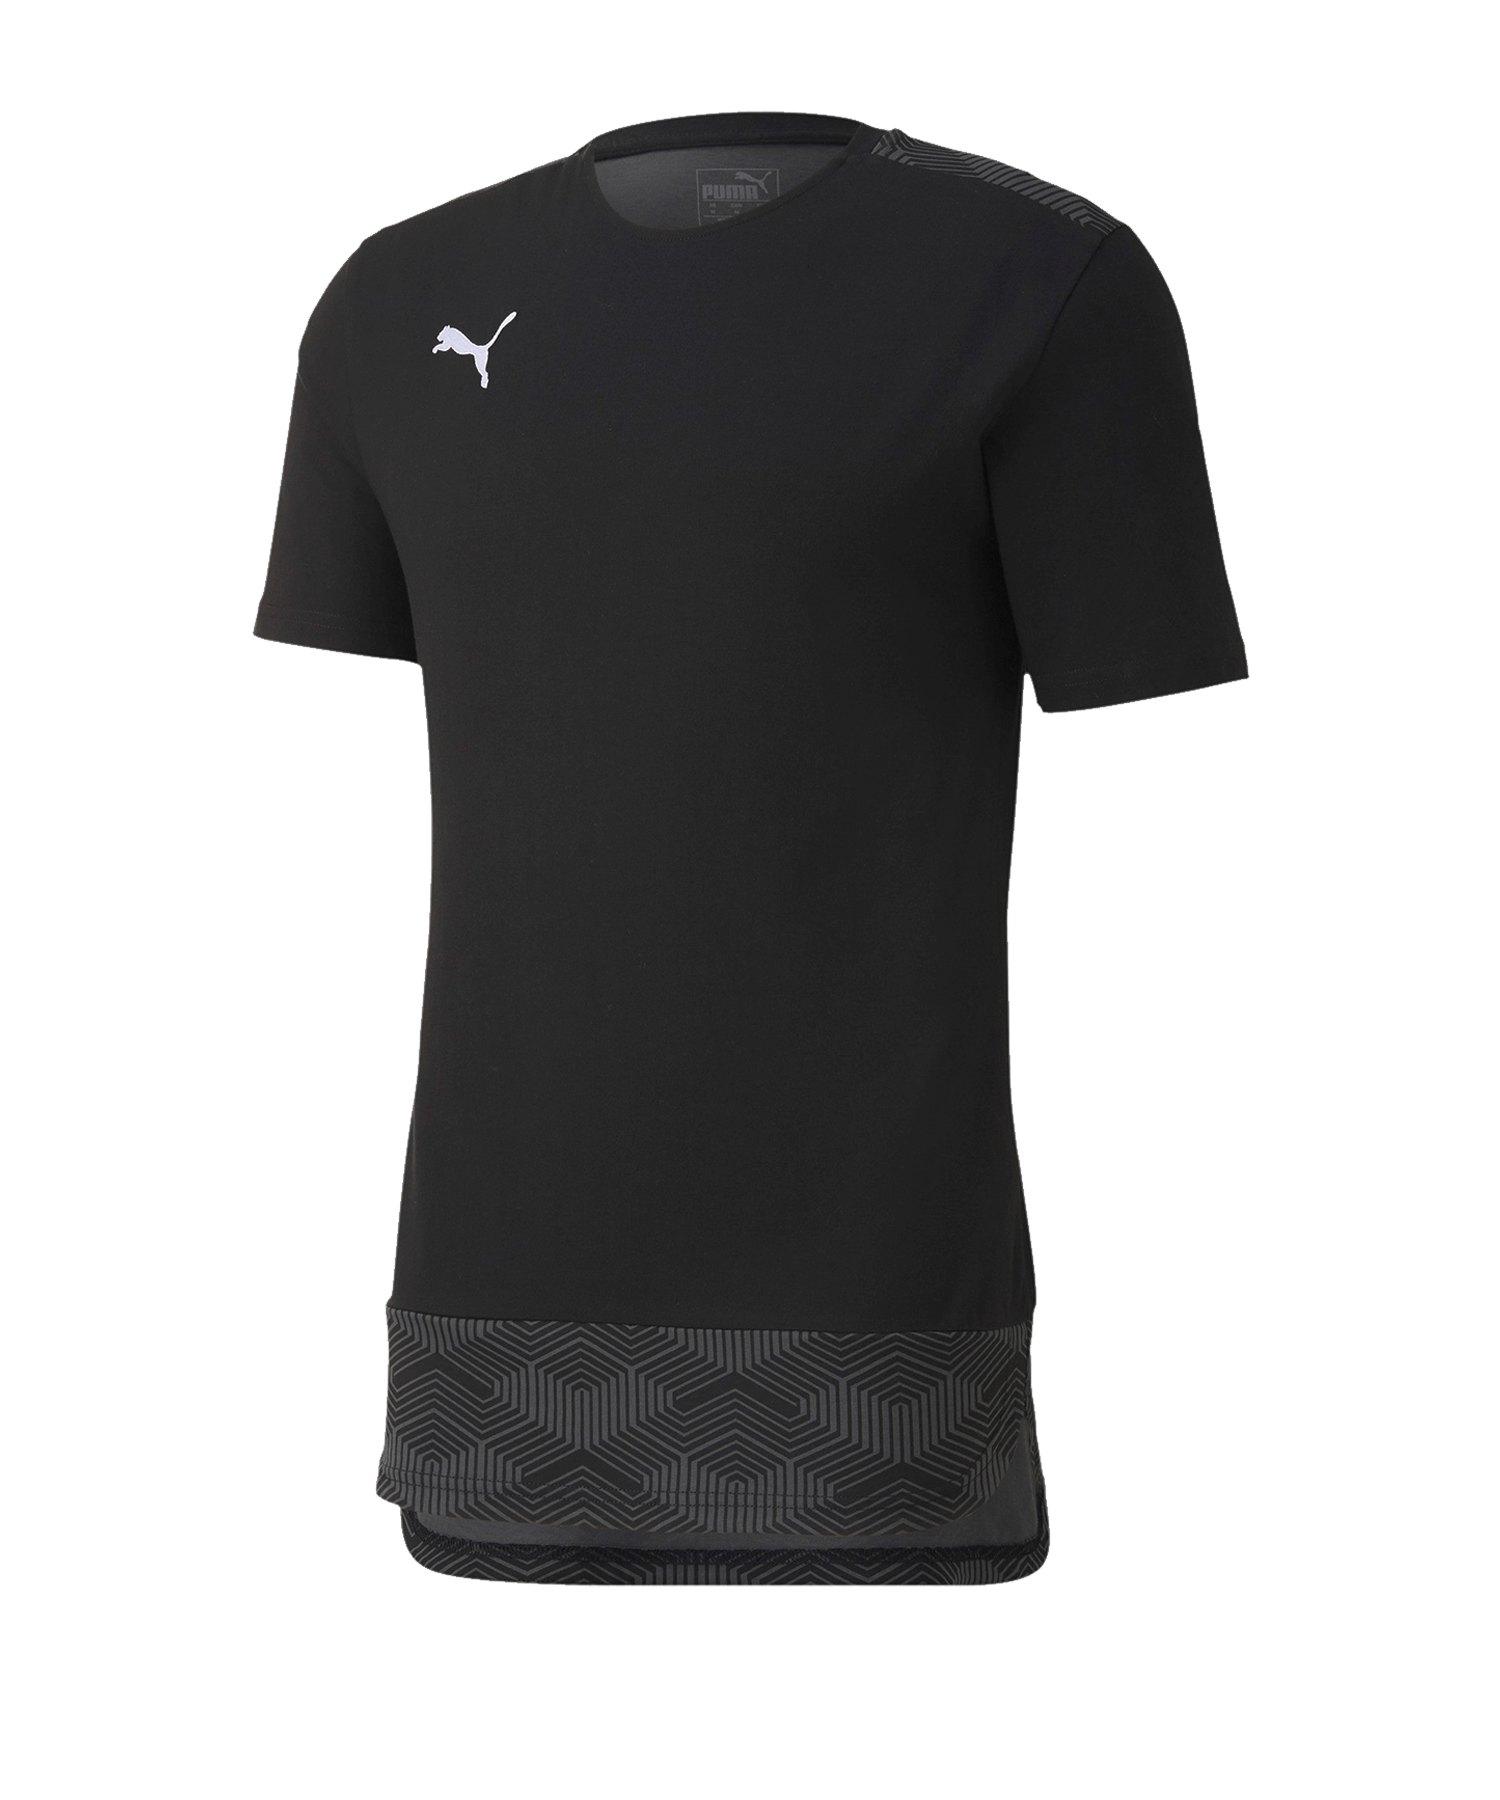 PUMA teamFINAL 21 Casuals Tee T-Shirt Schwarz F03 - schwarz